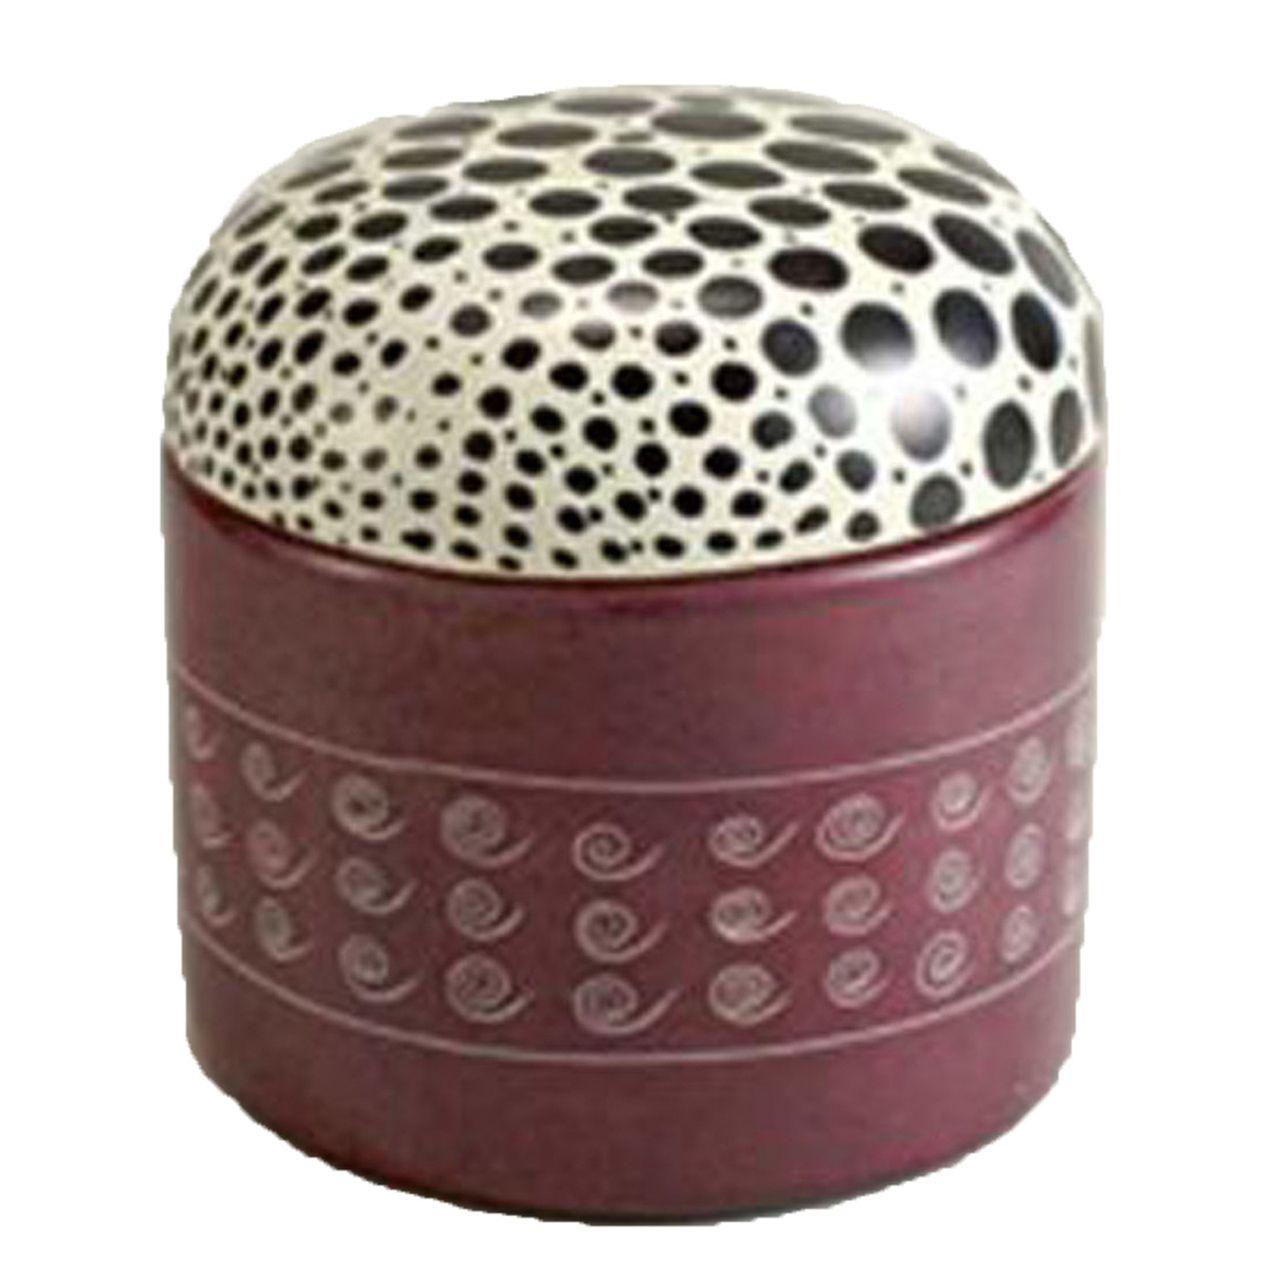 Decorative Round Boxes Decorative Boxes Stone Keepsake Box Spotted Animals Design